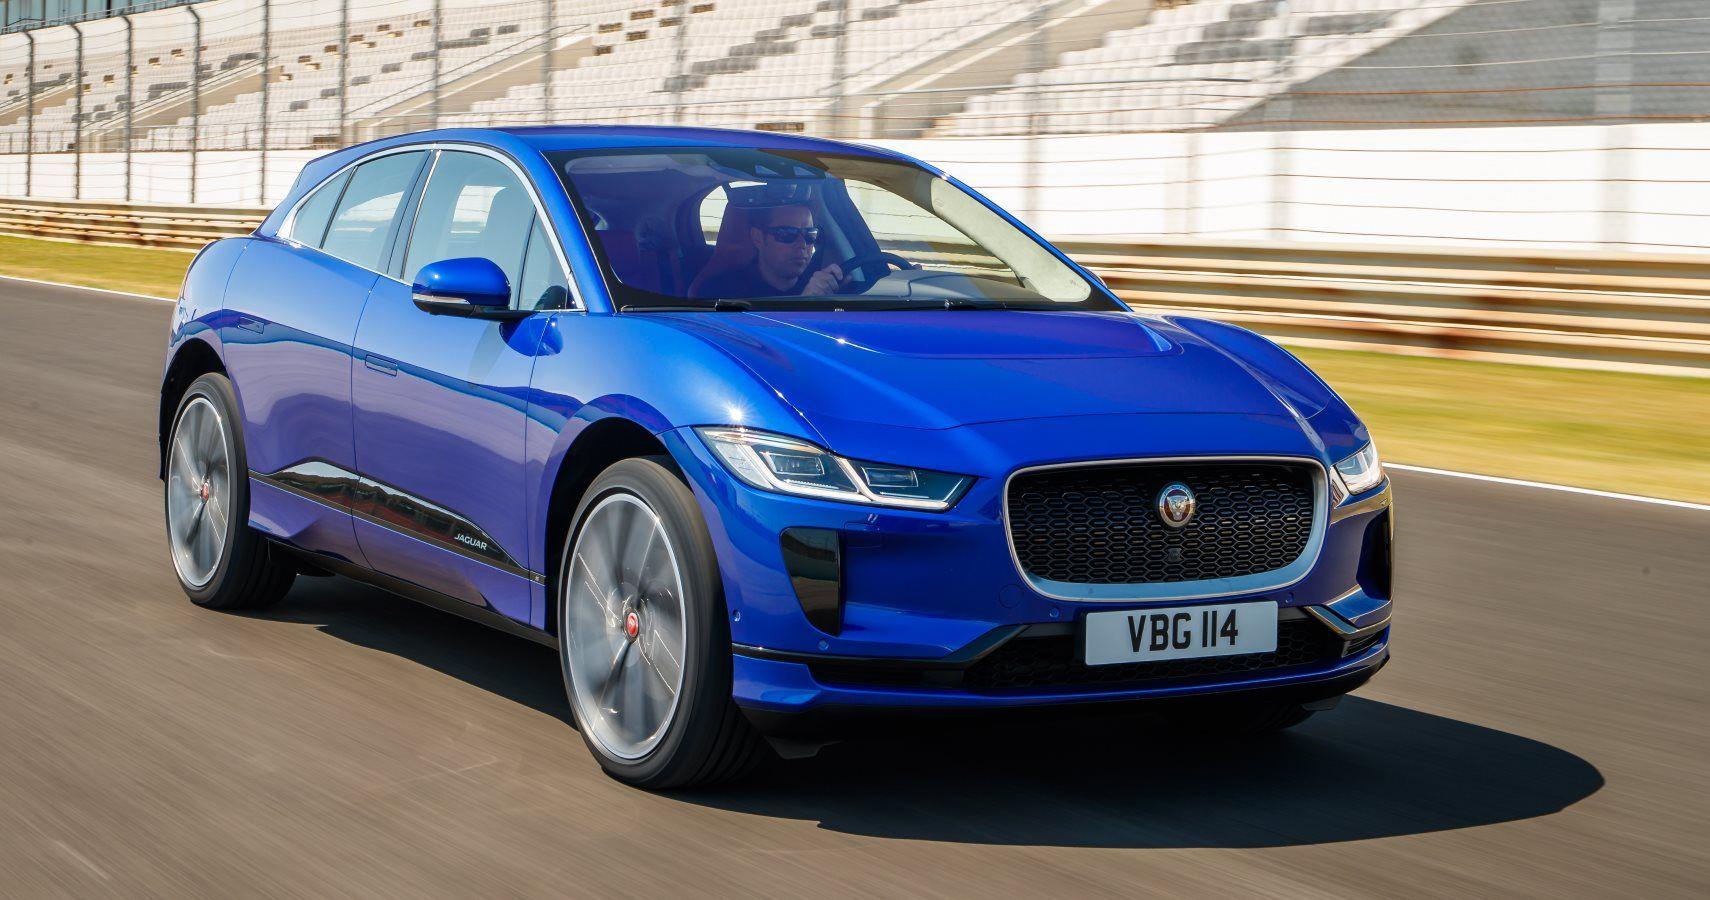 Review: Jaguar I-Pace – A Tesla Alternative